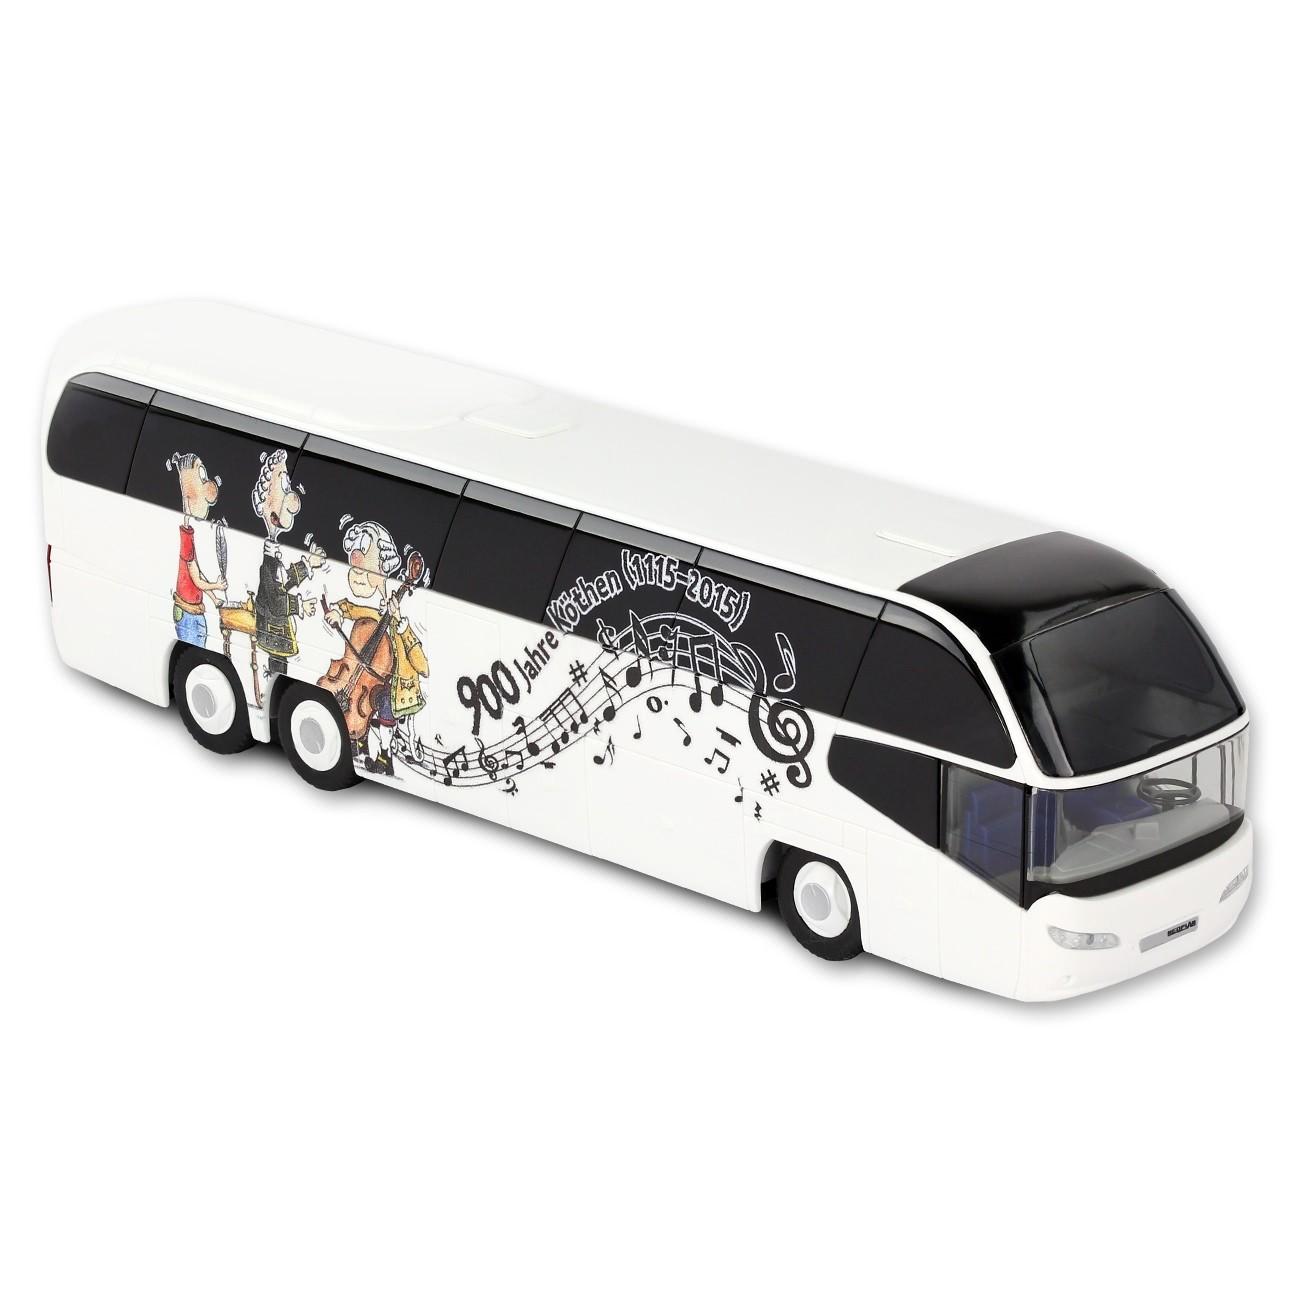 Reisebus - 900 Jahre Köthen - Dobo-Musiker - Spielzeug Modell Bus KOK61W